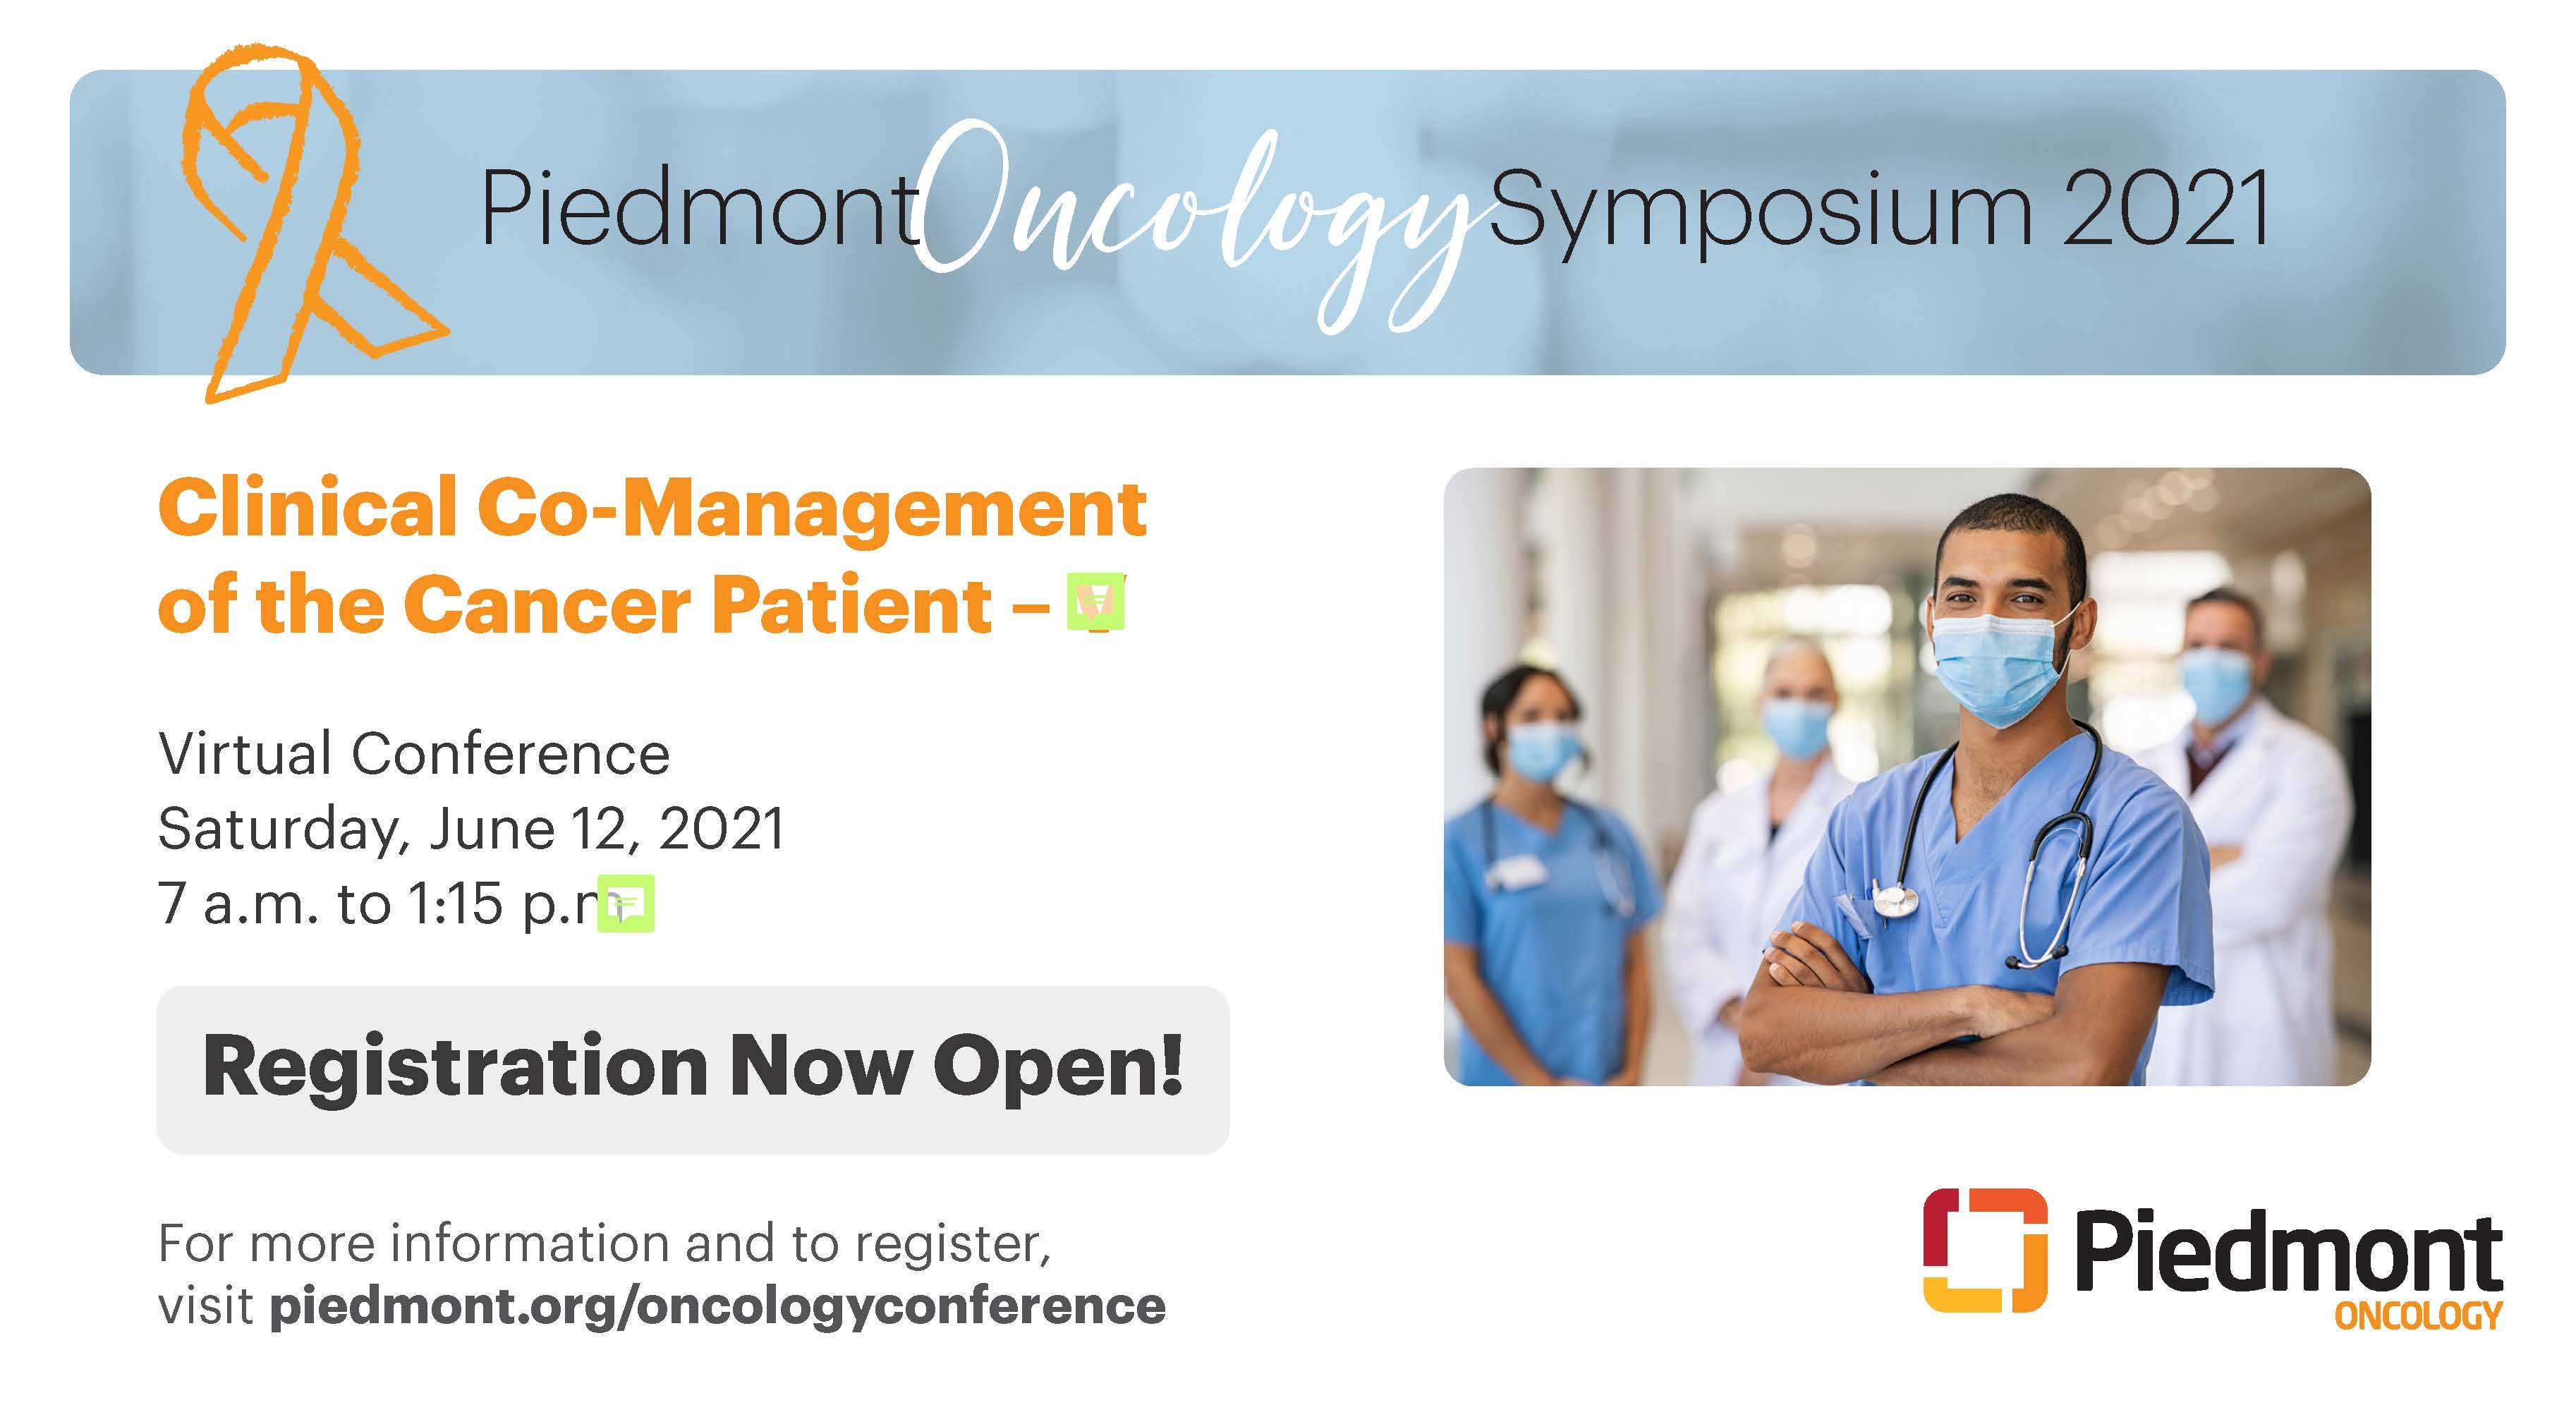 Piedmont Oncology Virtual Symposium 2021